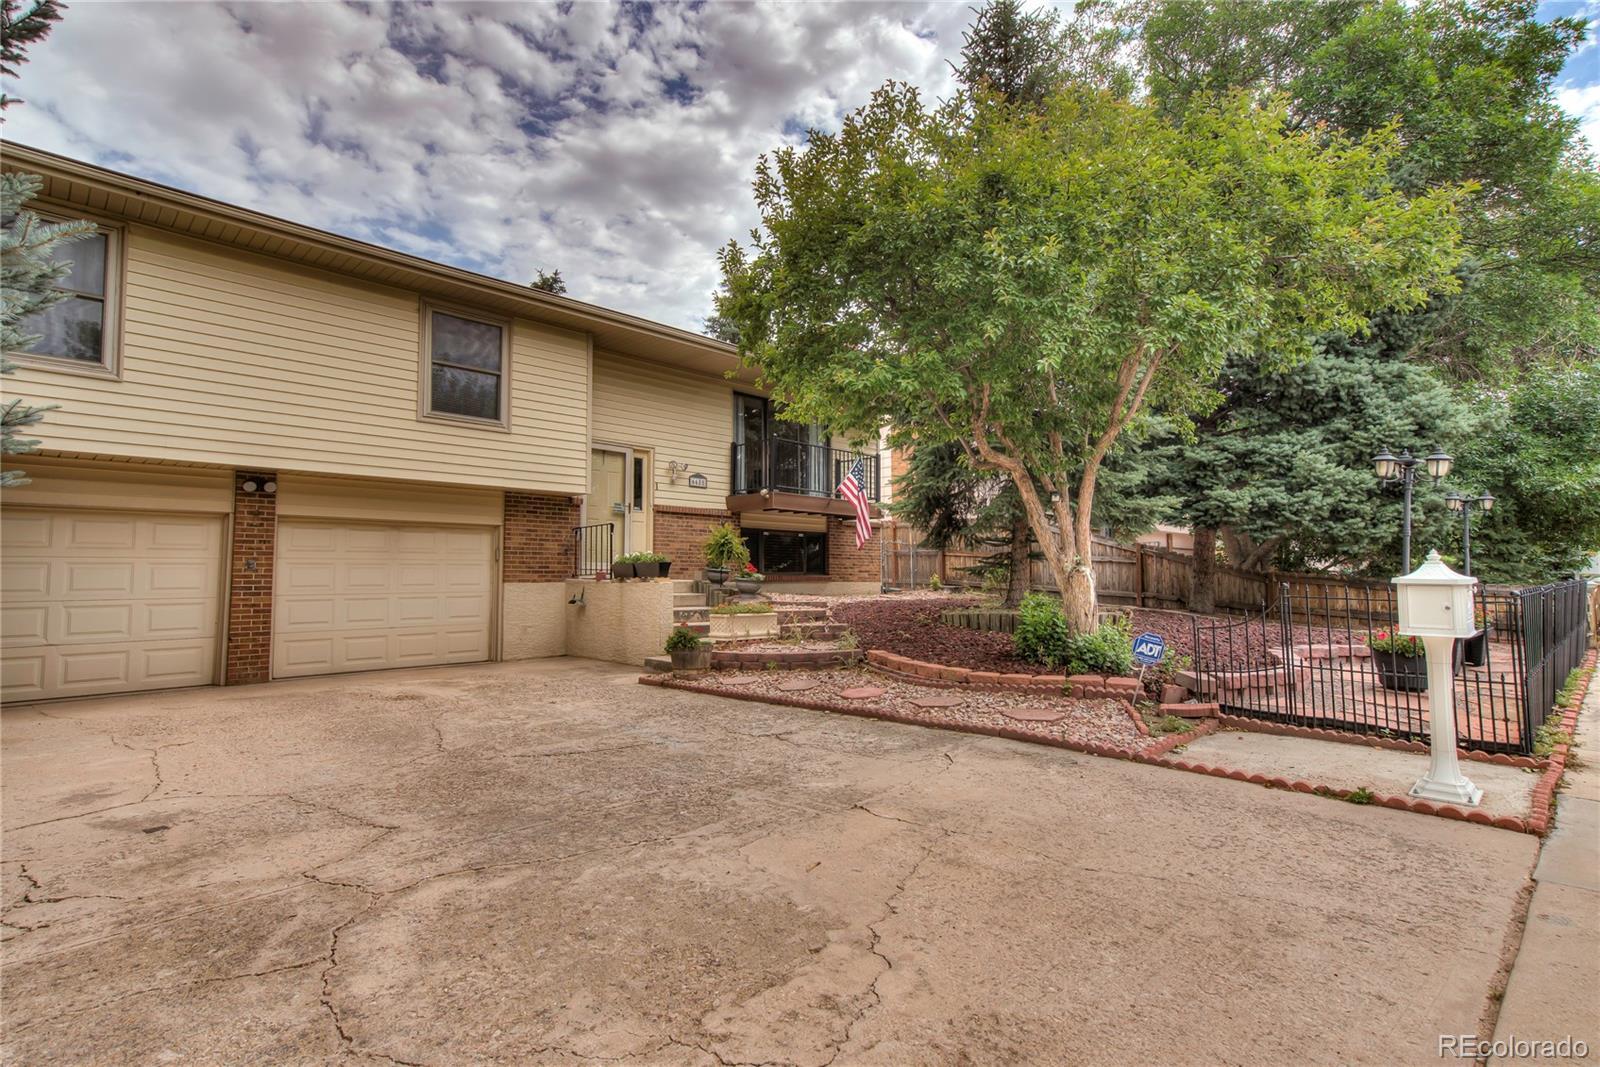 MLS# 2141630 - 36 - 6685 Brook Park Drive, Colorado Springs, CO 80918